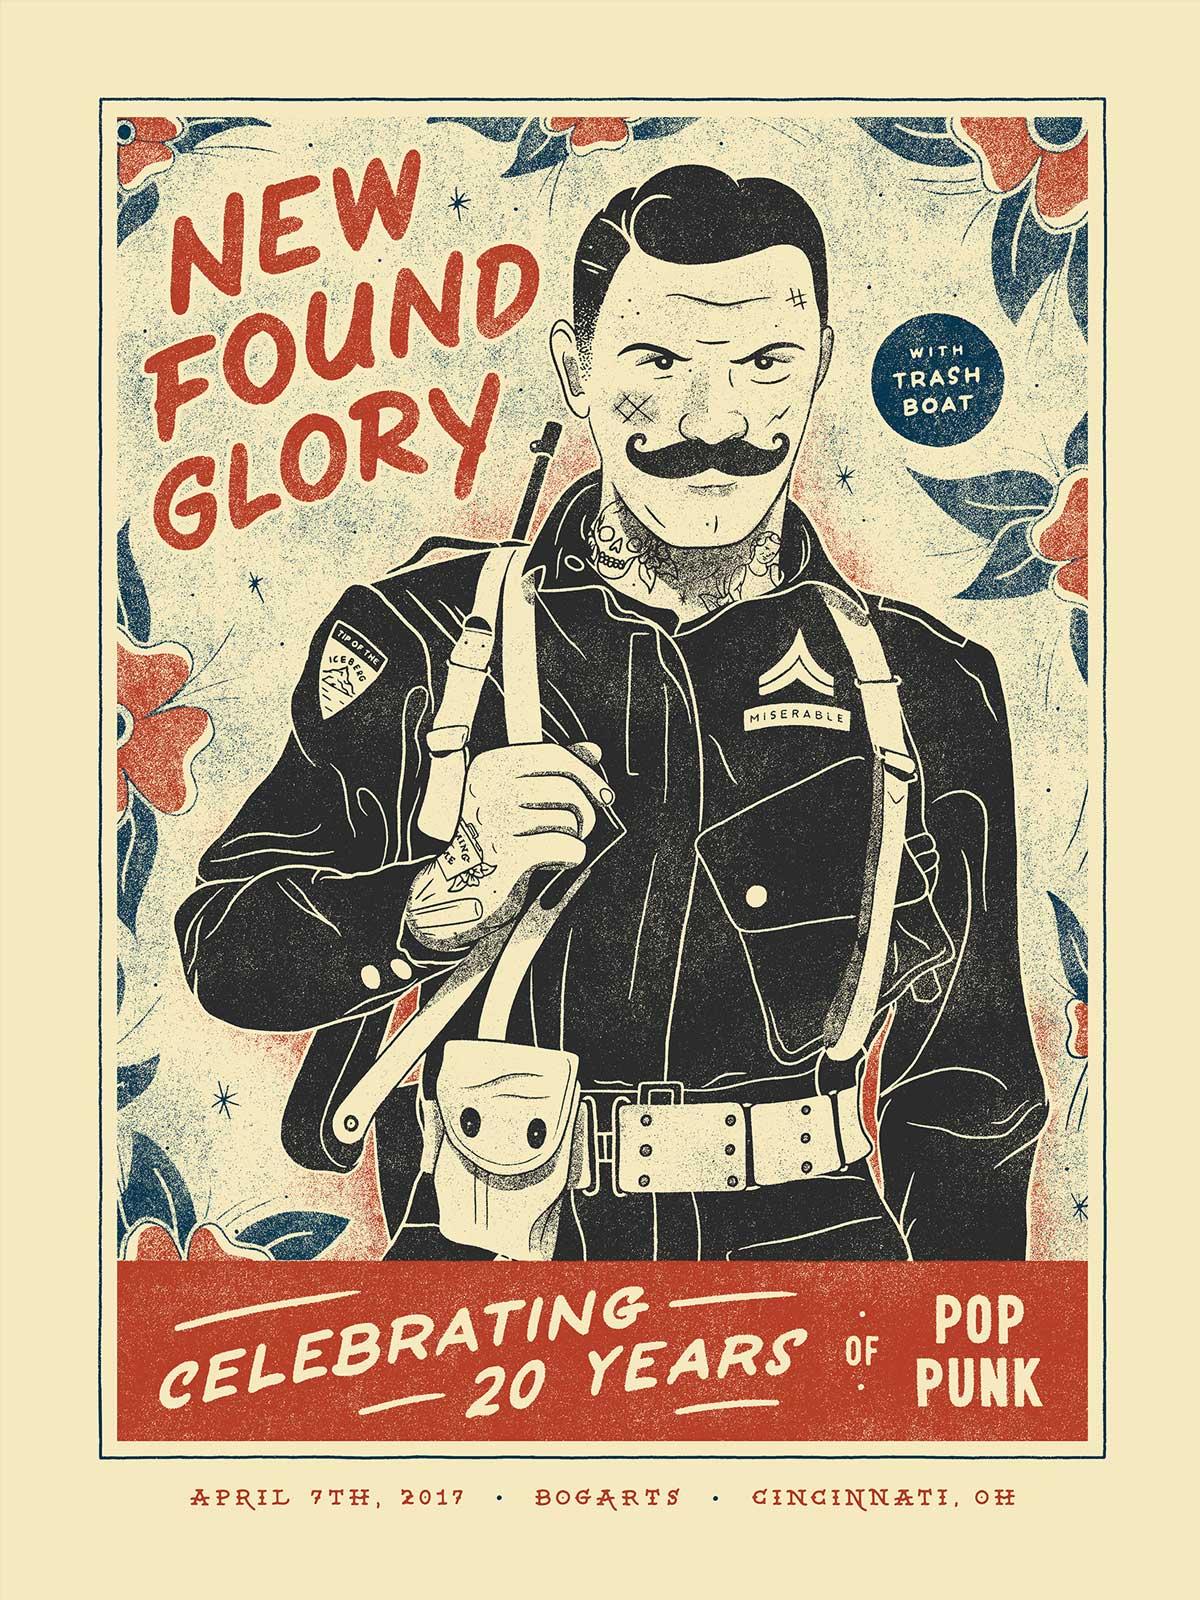 Illustrierte Konzert-Plakate von Nicholas Moegly gig-posters-Nicholas-Moegly_03